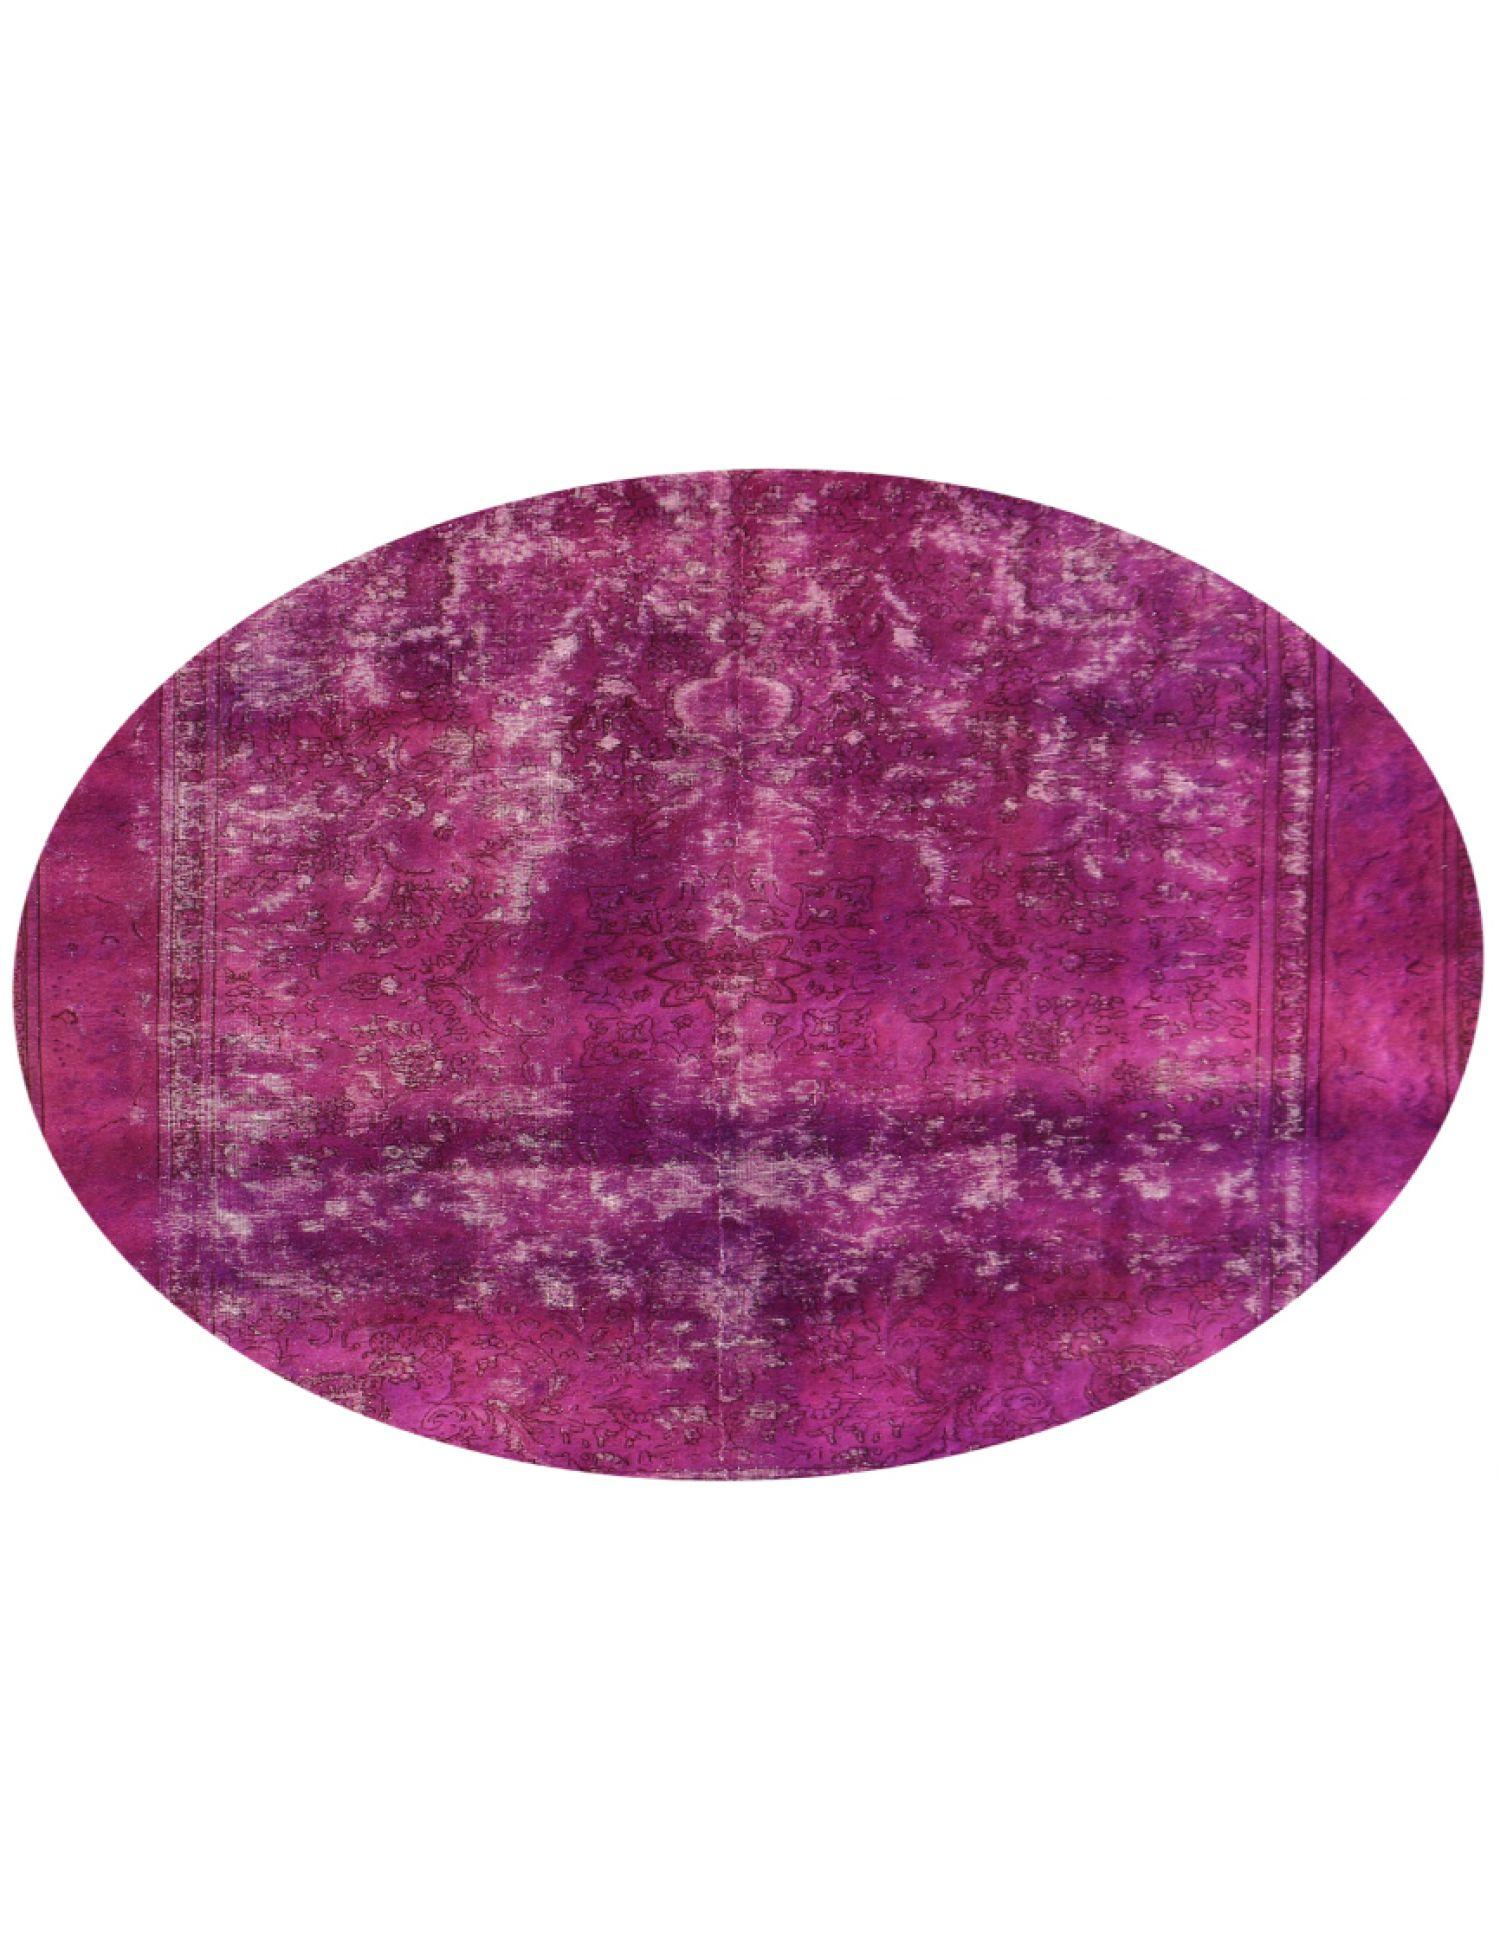 Vintage Teppich  lila <br/>284 x 284 cm